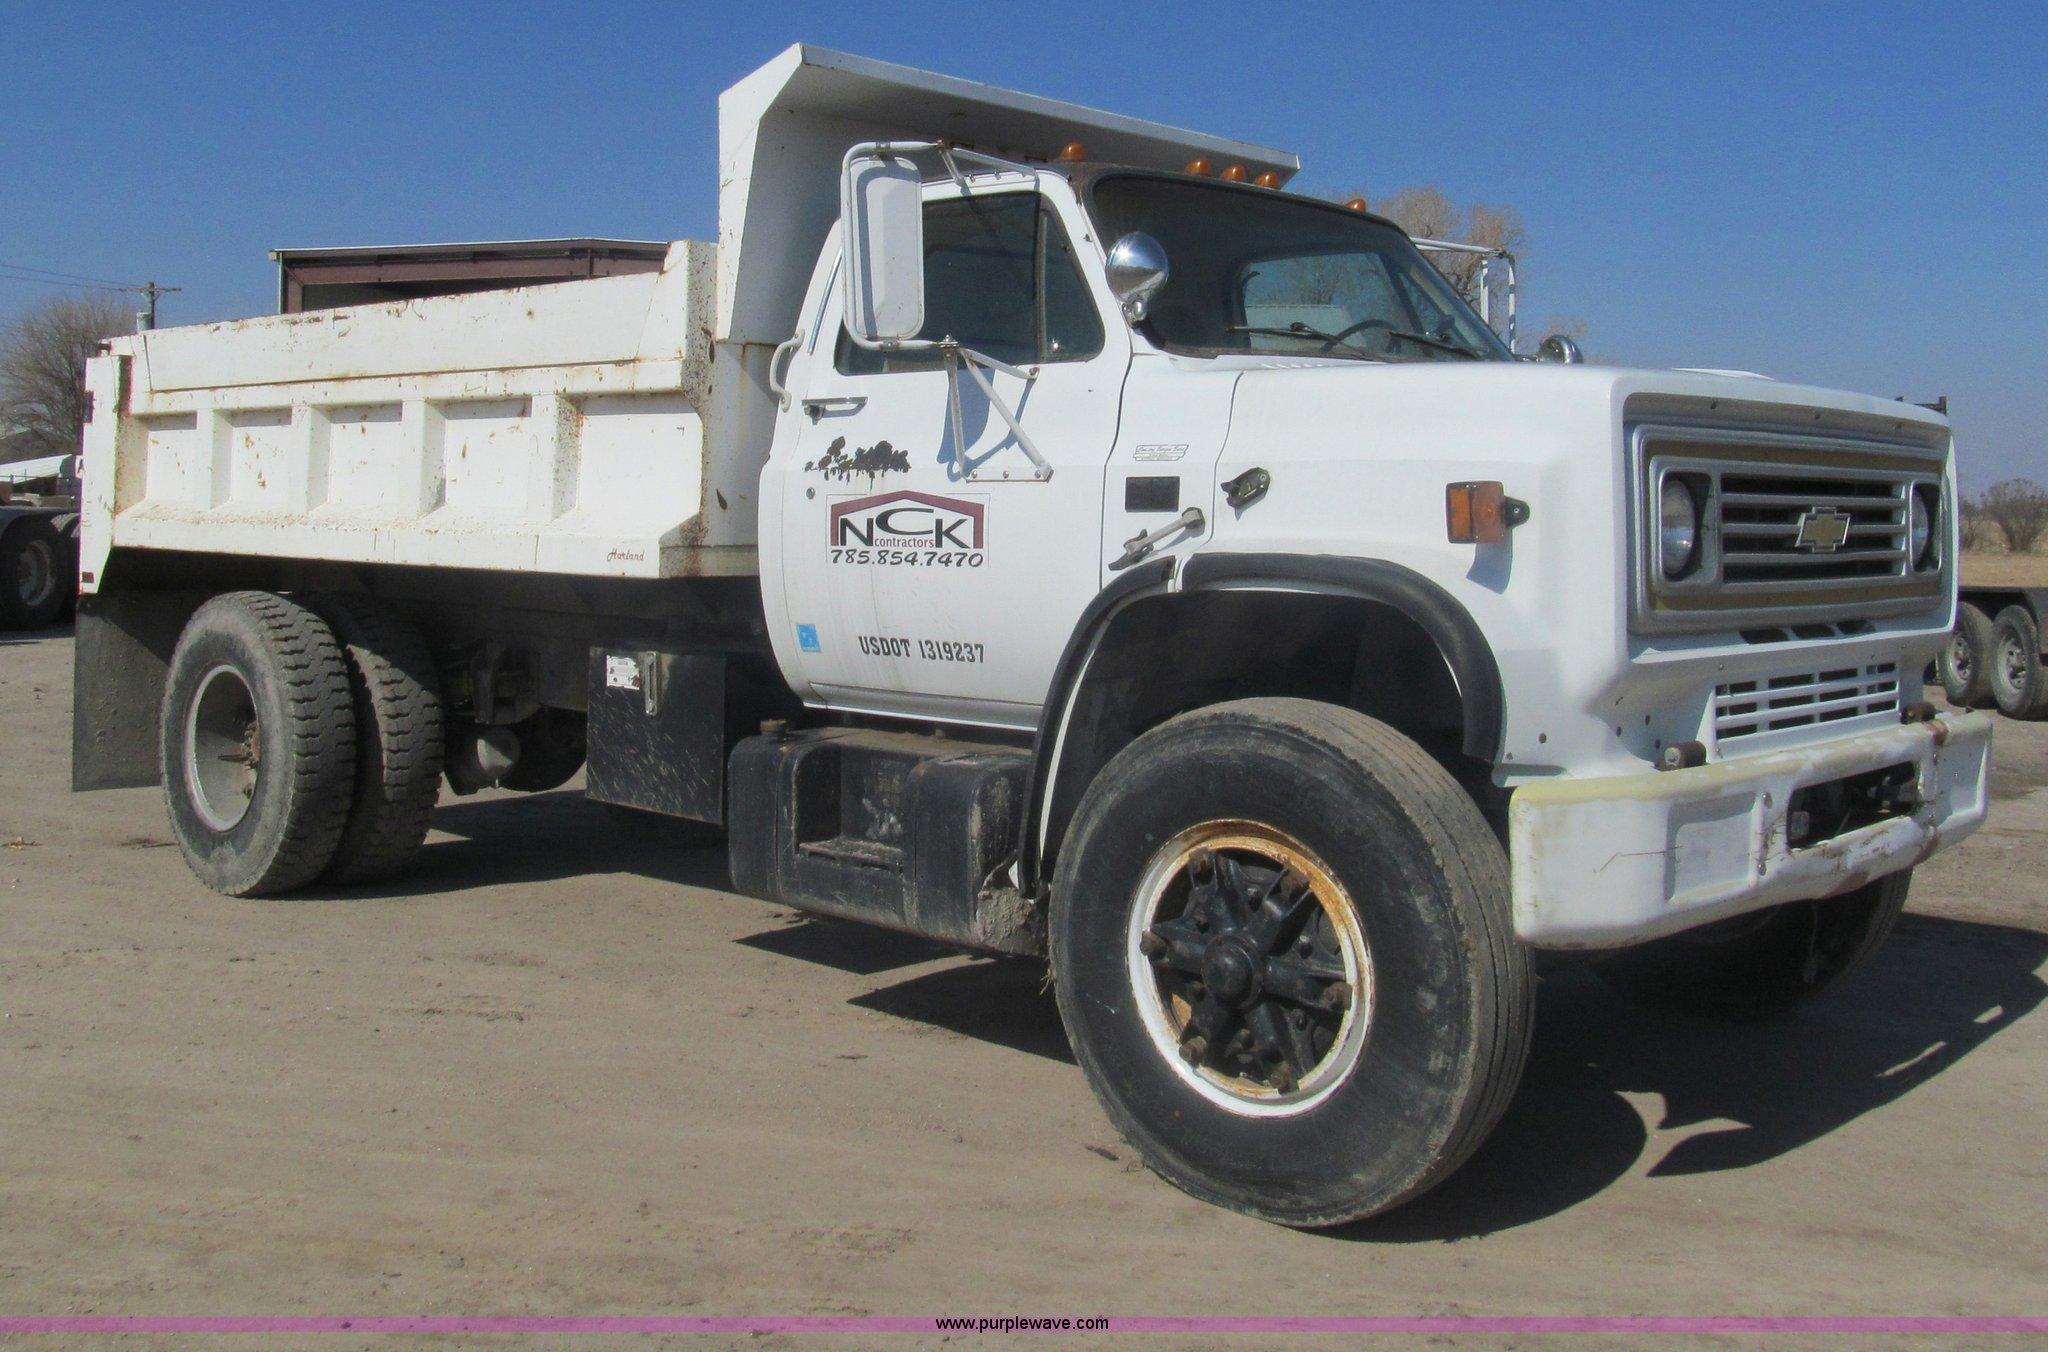 1988 Chevrolet Kodiak C70 dump truck | Item I7233 | SOLD! Ma